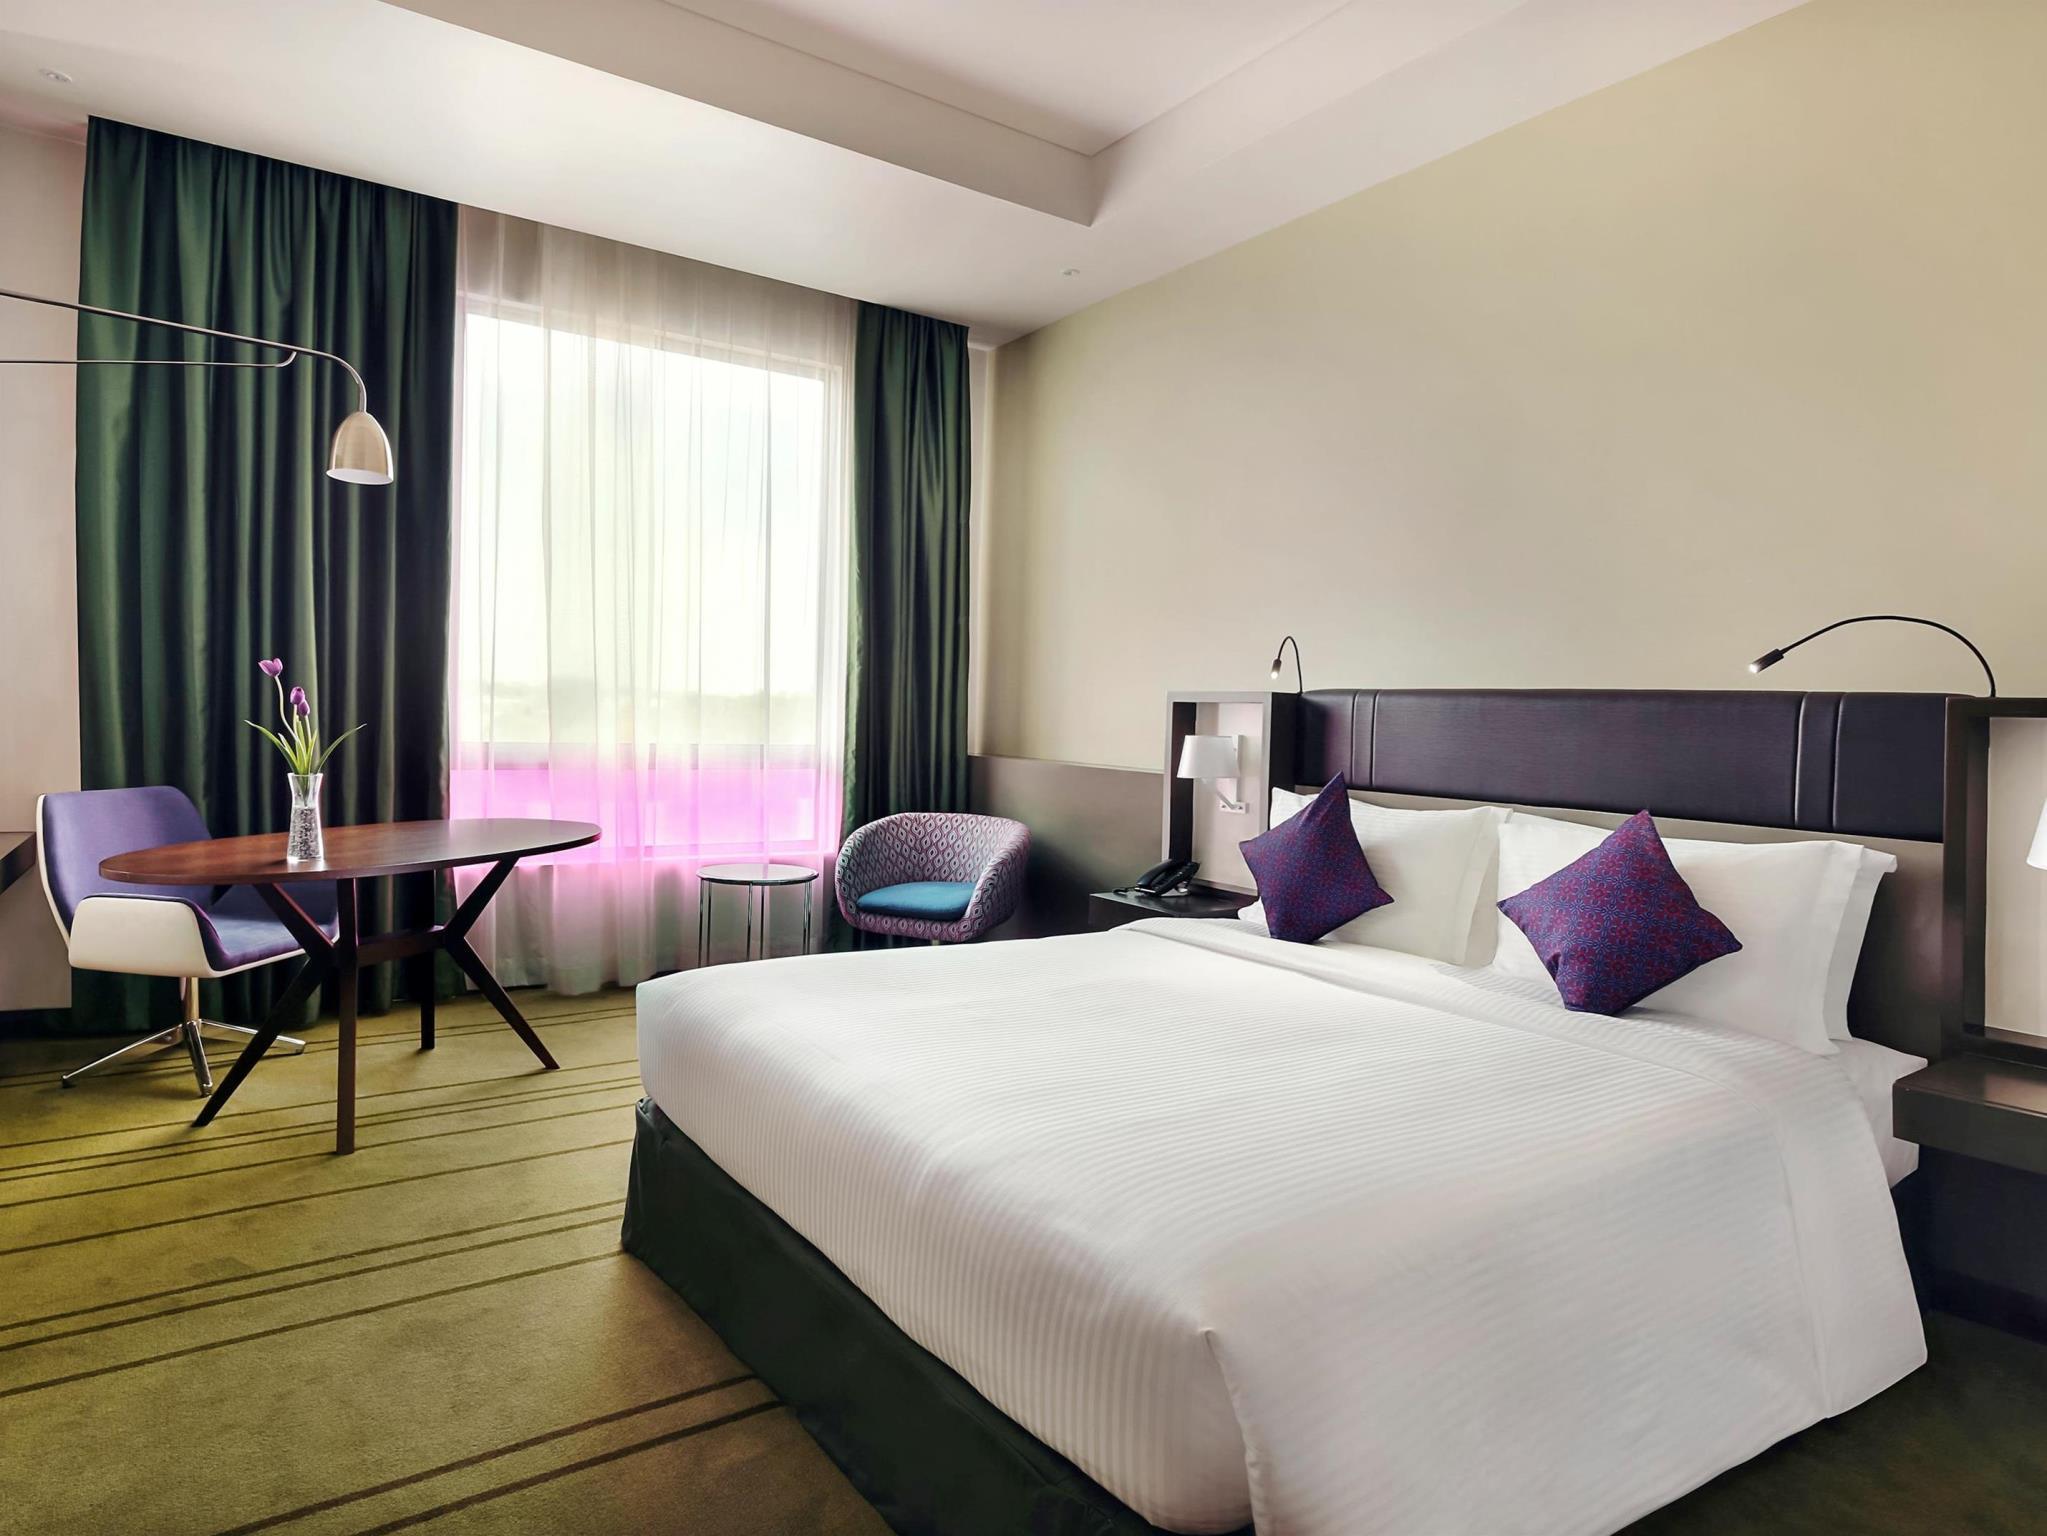 Avangio Hotel Kota Kinabalu Managed By AccorHotels, Kota Kinabalu